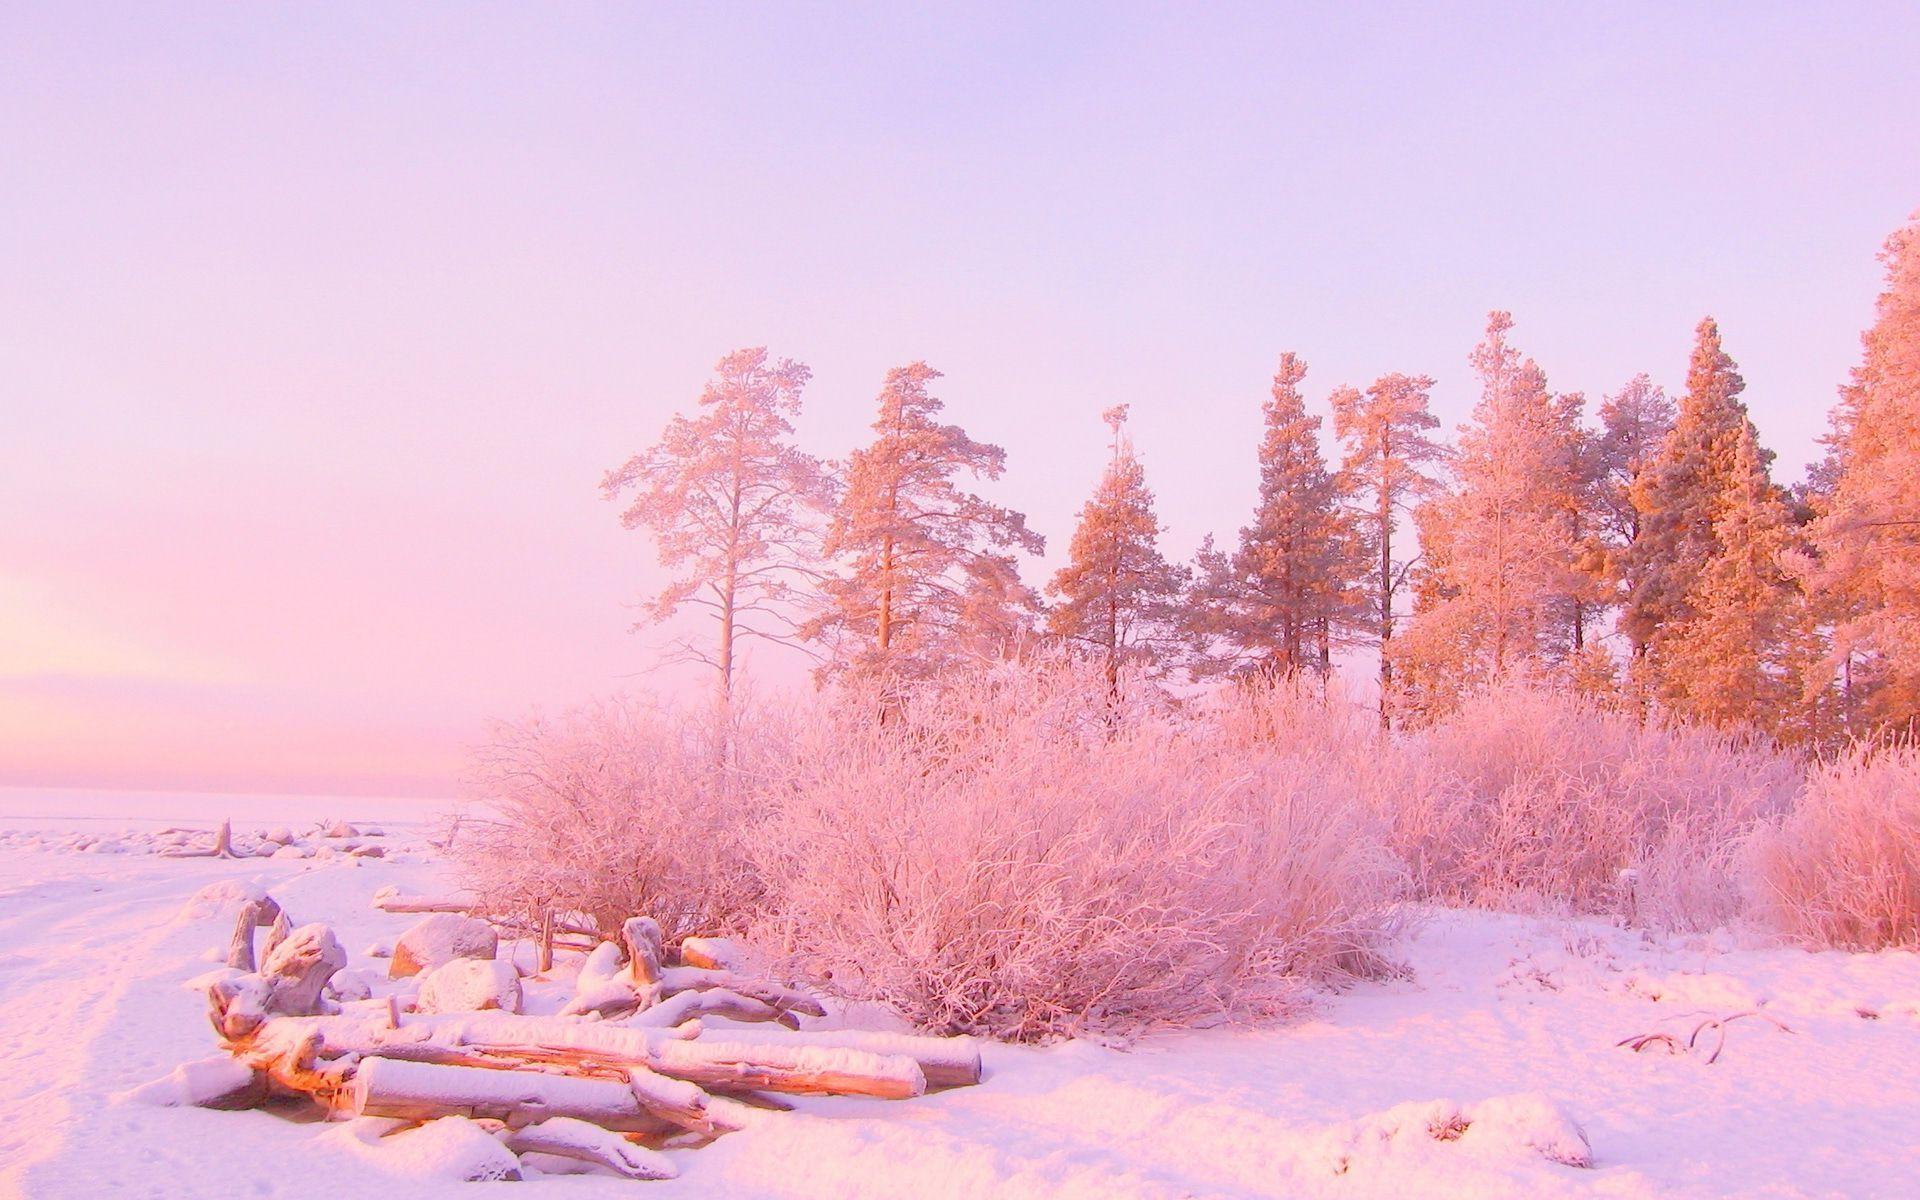 Pink Aesthetic Snow Landscape ...